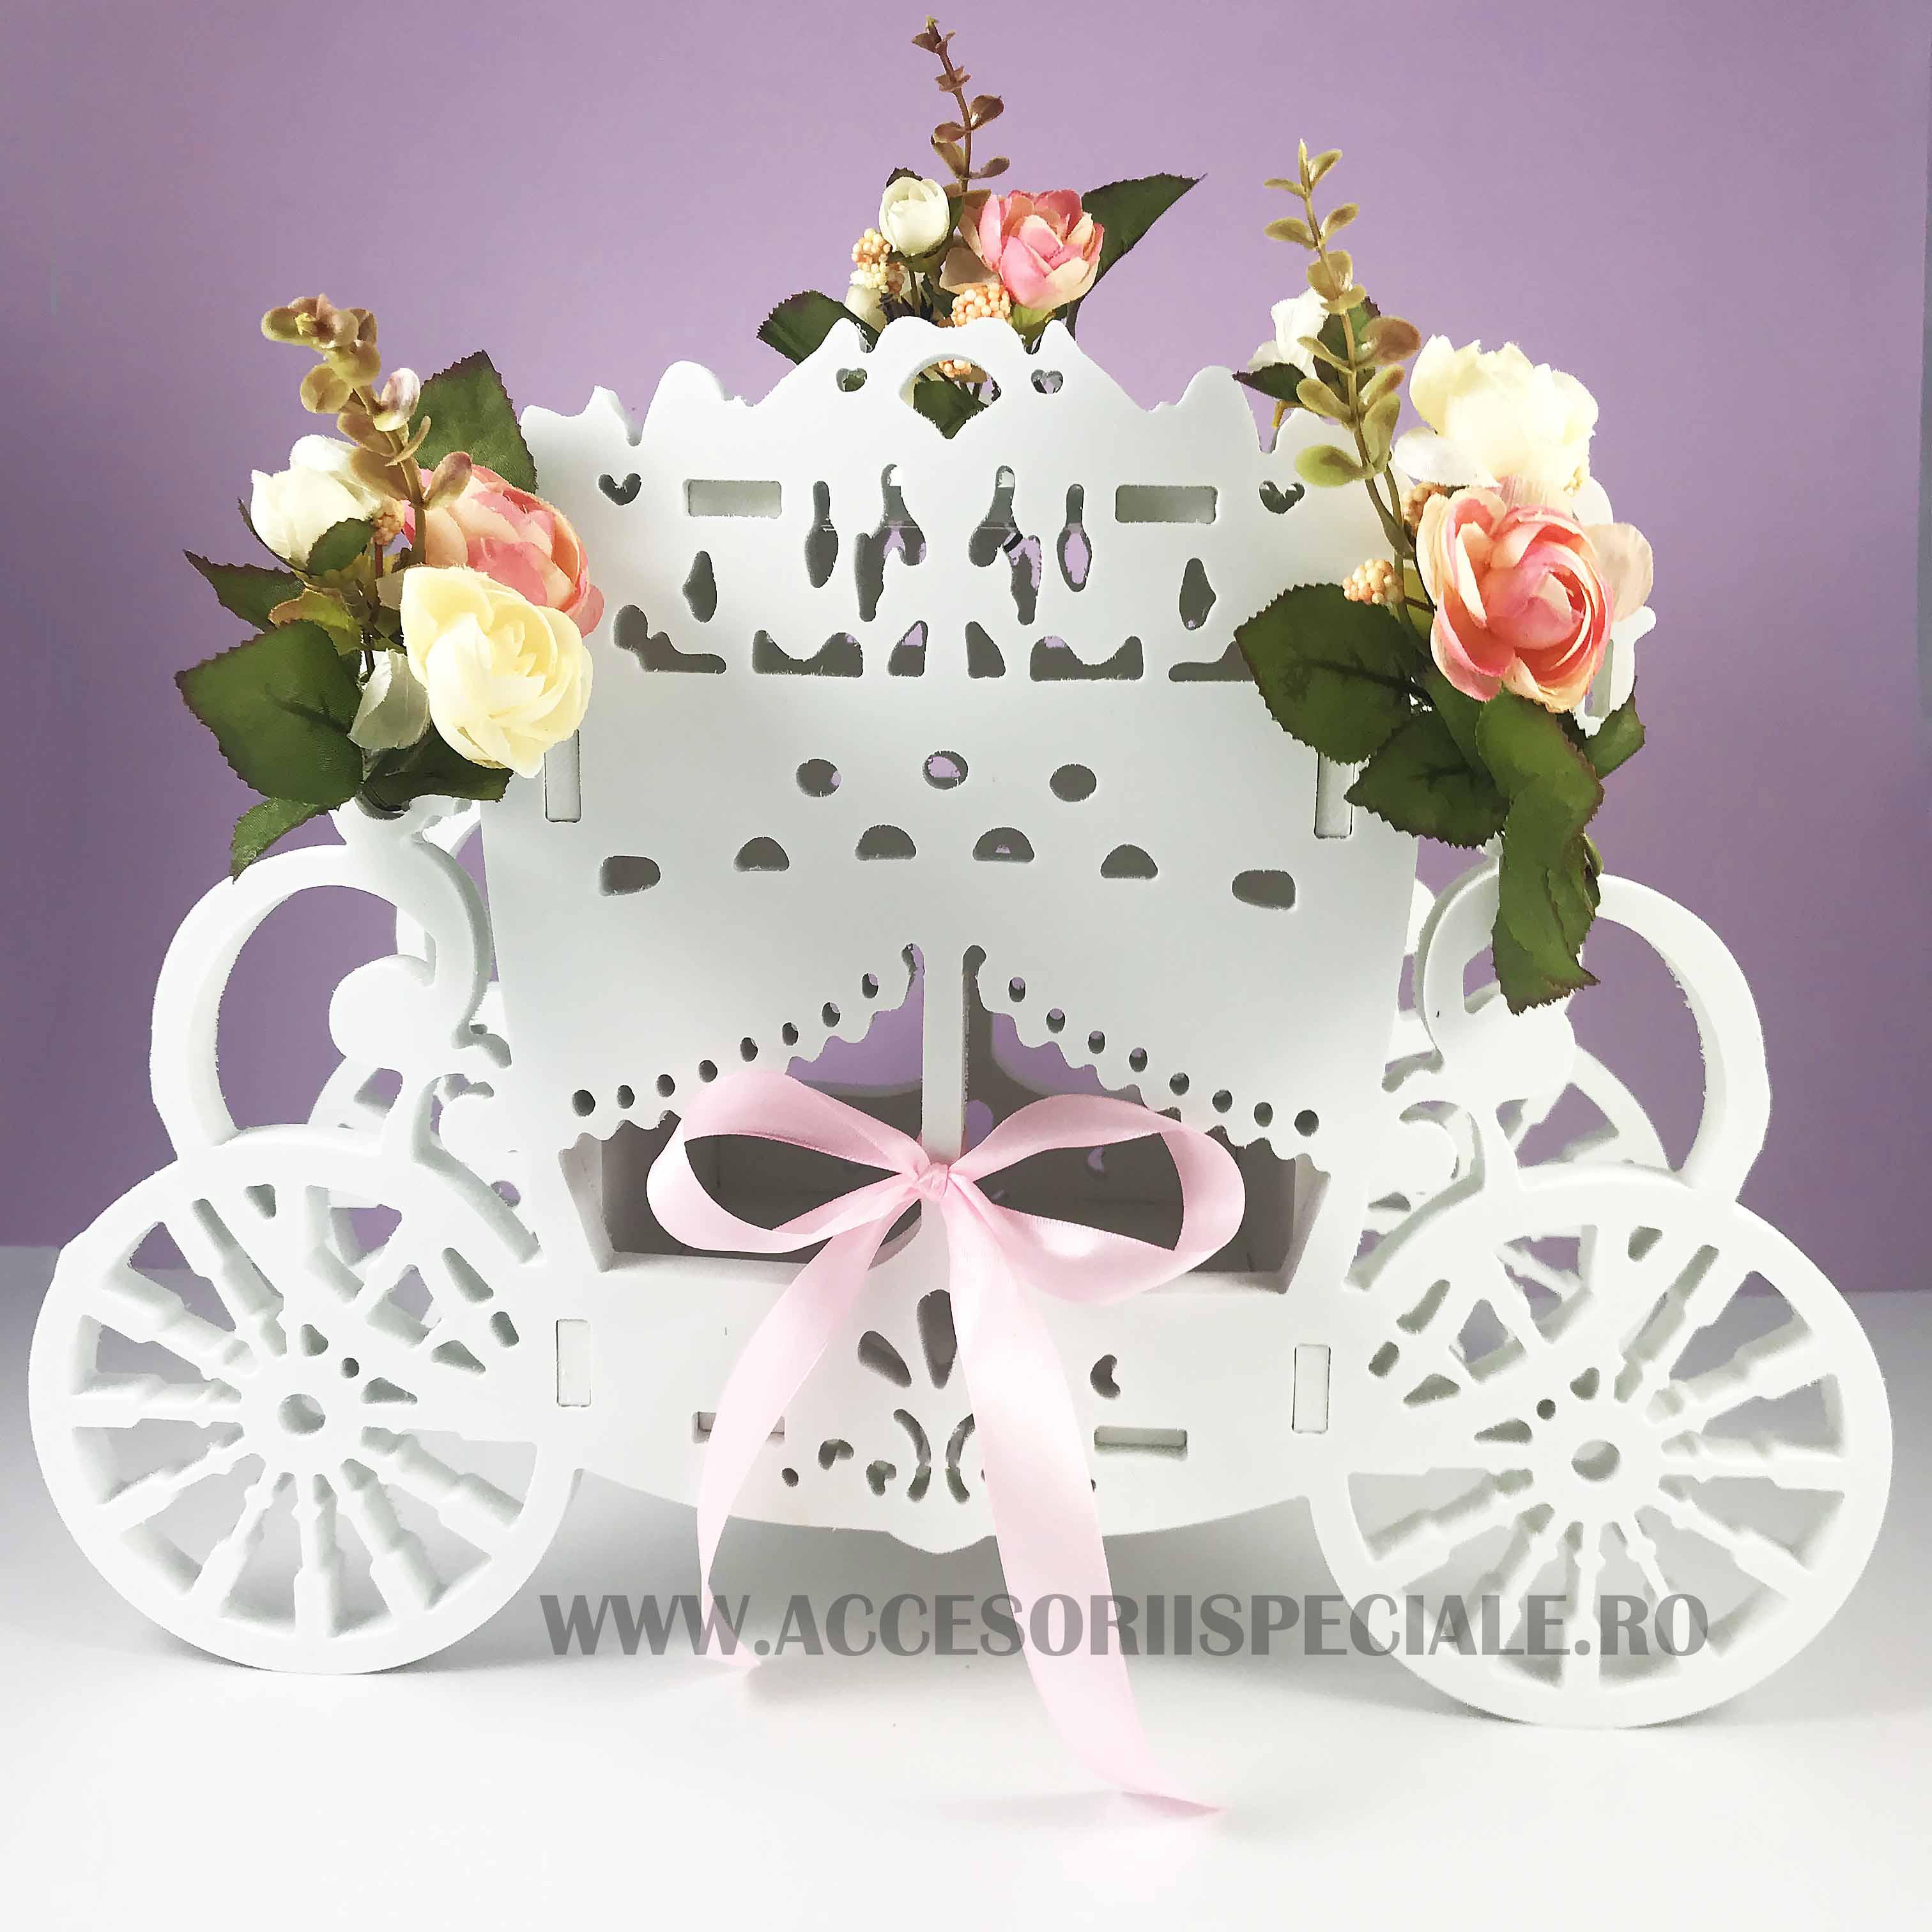 Accesorii Speciale Invitatii Nunta Invitatii Botez Marturii Nunta